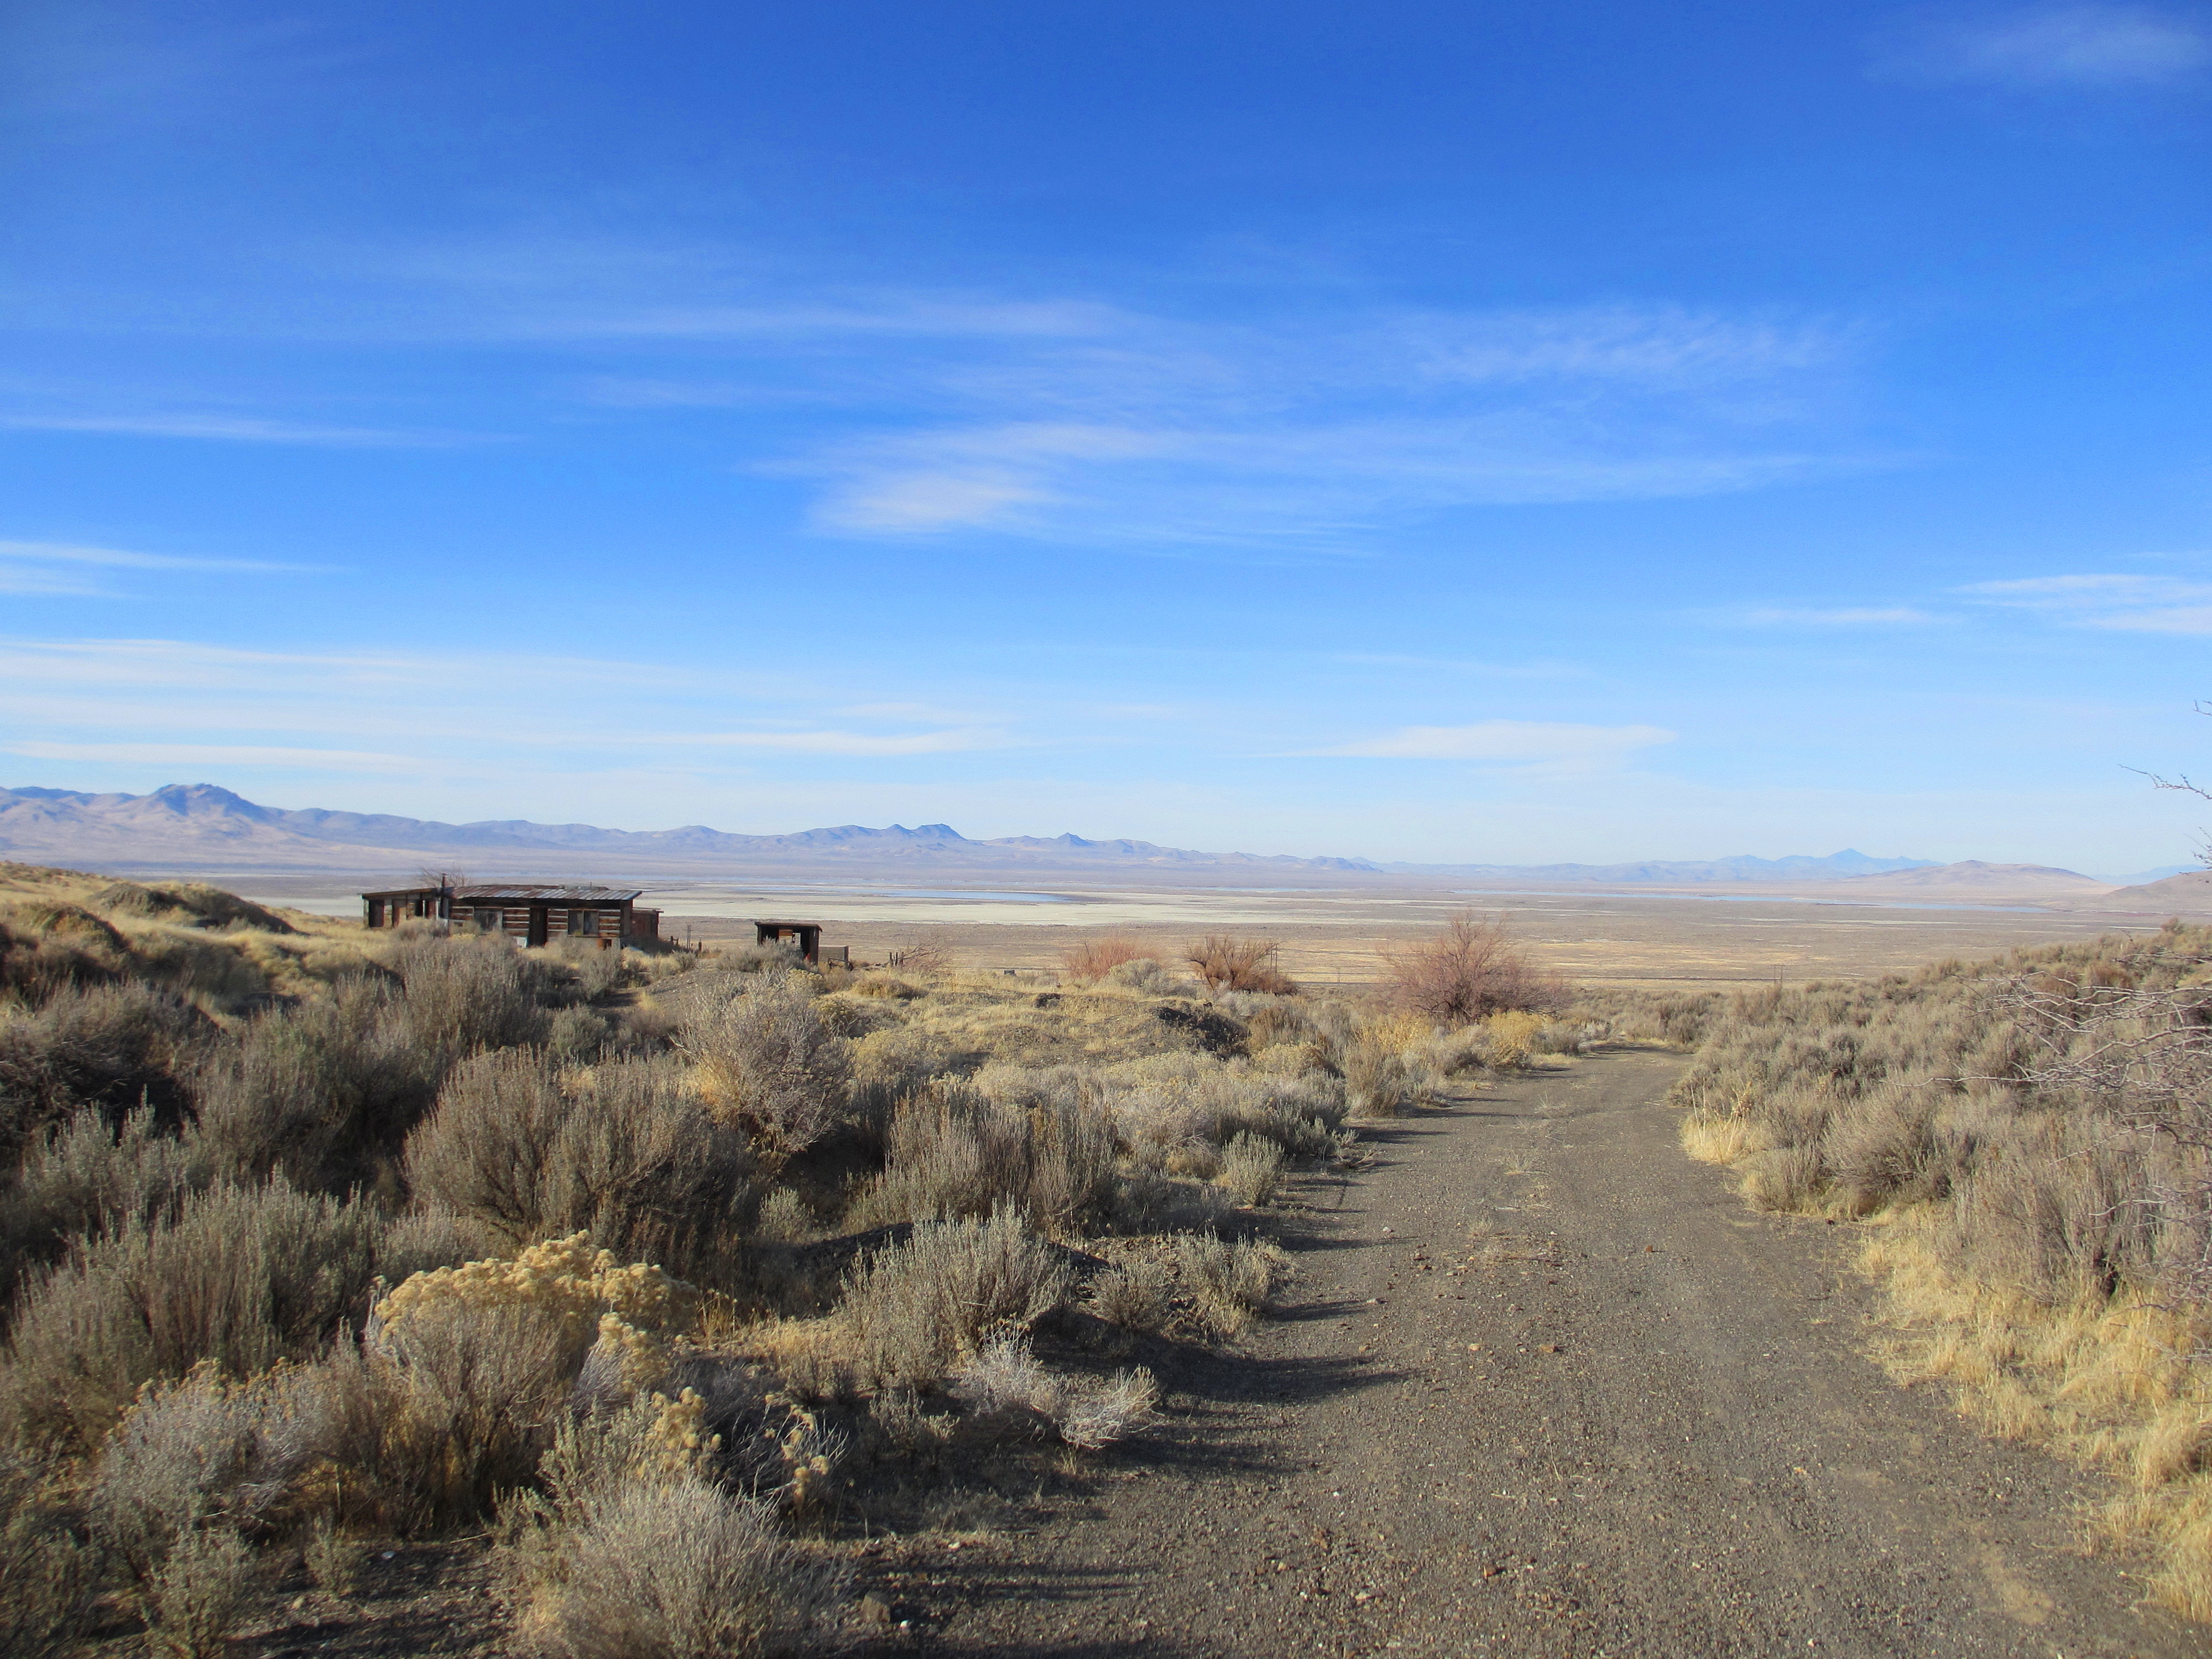 ... and Beautiful: Abandoned Desert Homestead » Nevada Desert Homestead: http://godguidesme.com/2012/02/25/broken-and-beautiful-abandoned-homestead-in-the-nevada-desert/img_0535-edited